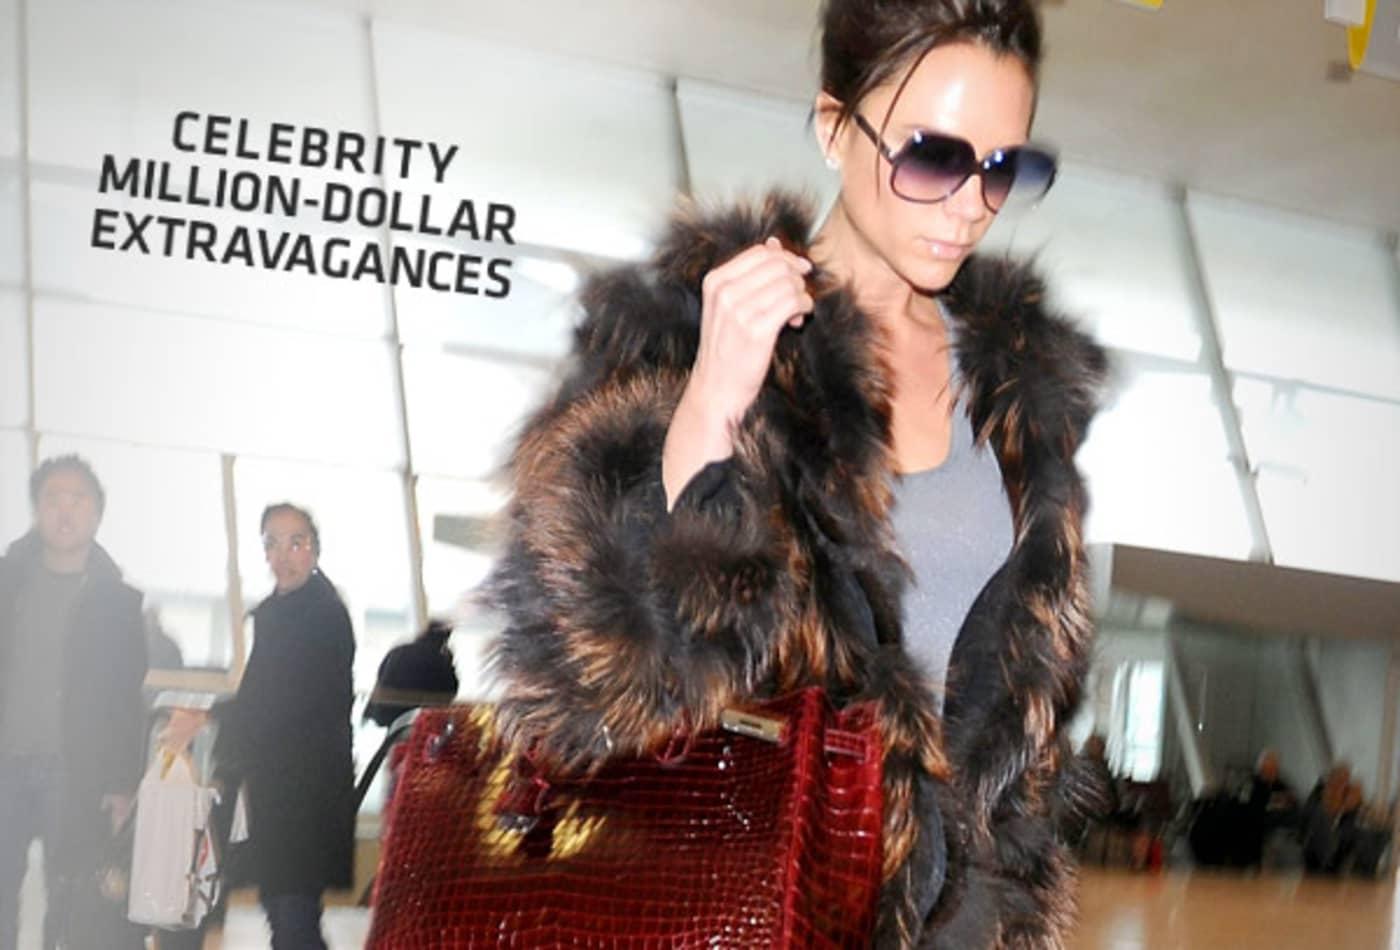 SS_Celebrity_Extravagances_Cover.jpg